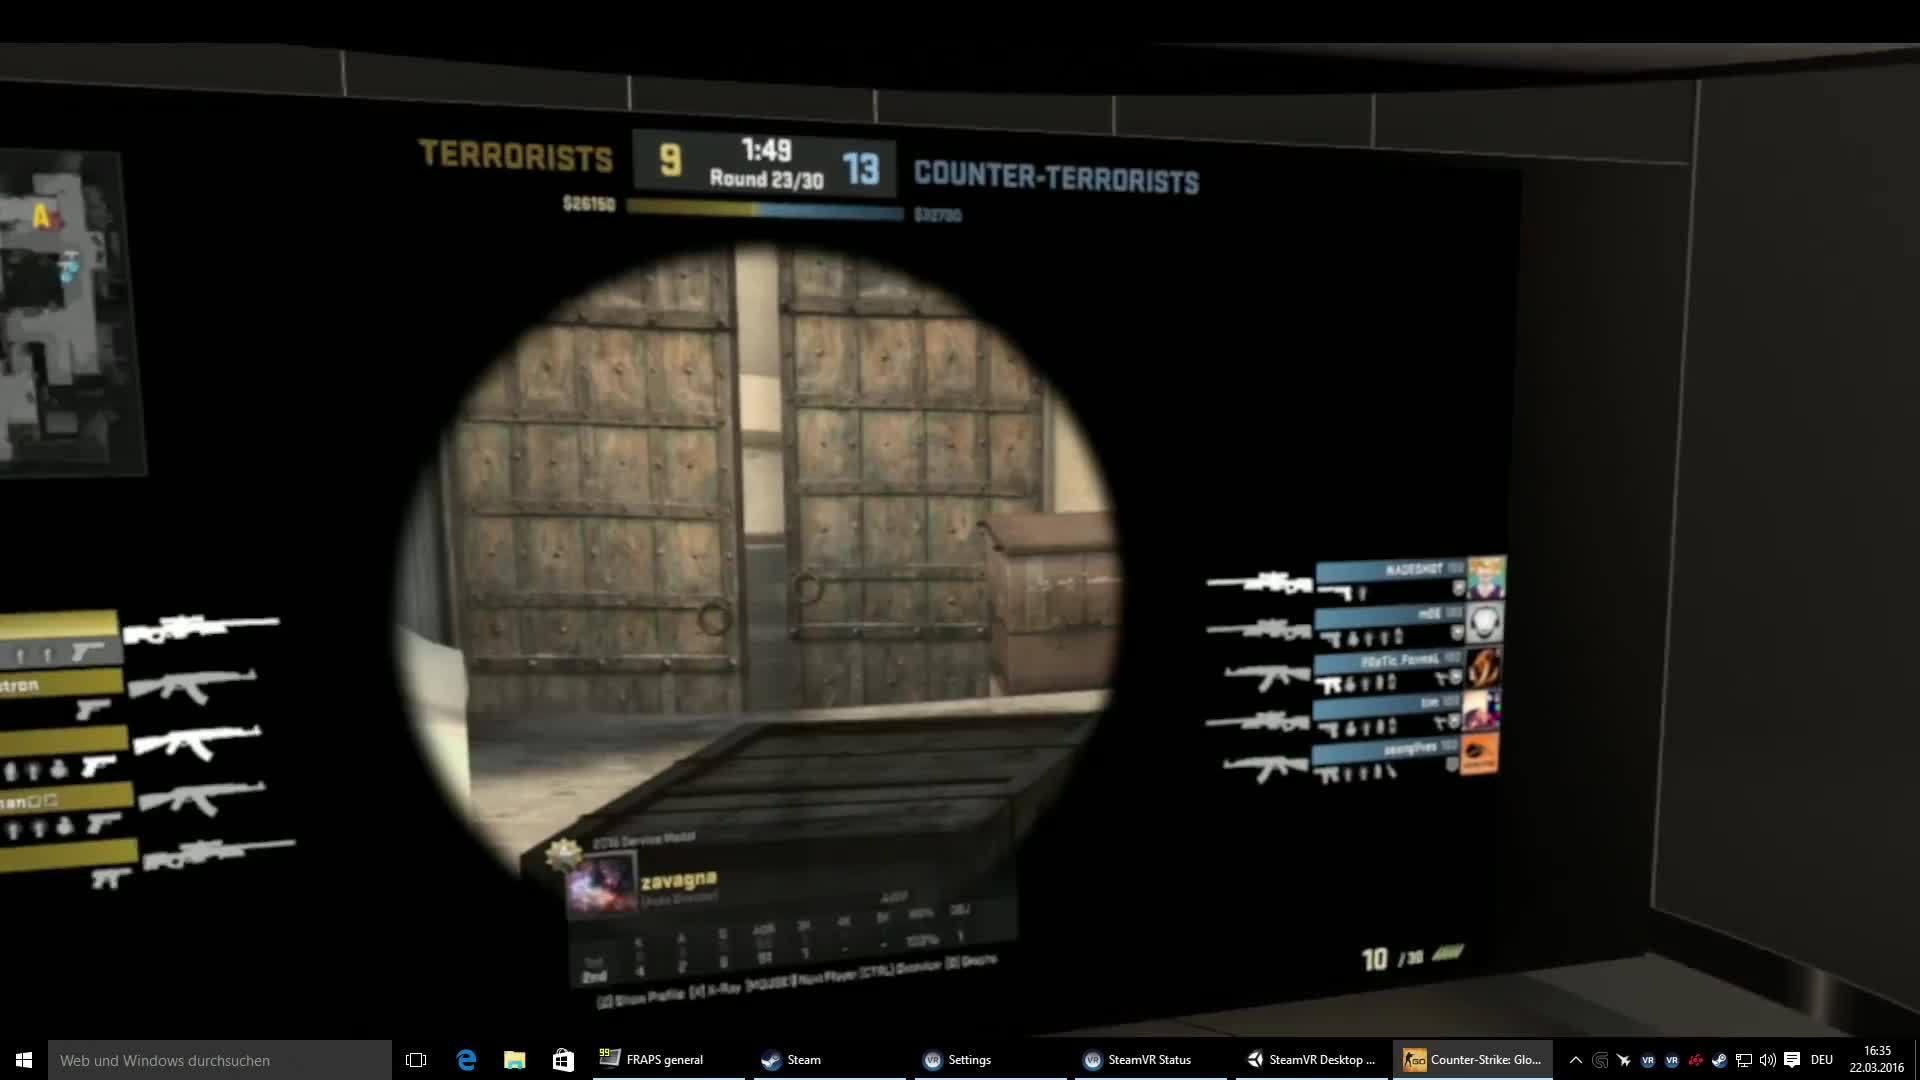 SteamVR Desktop Theater Mode ausprobiert